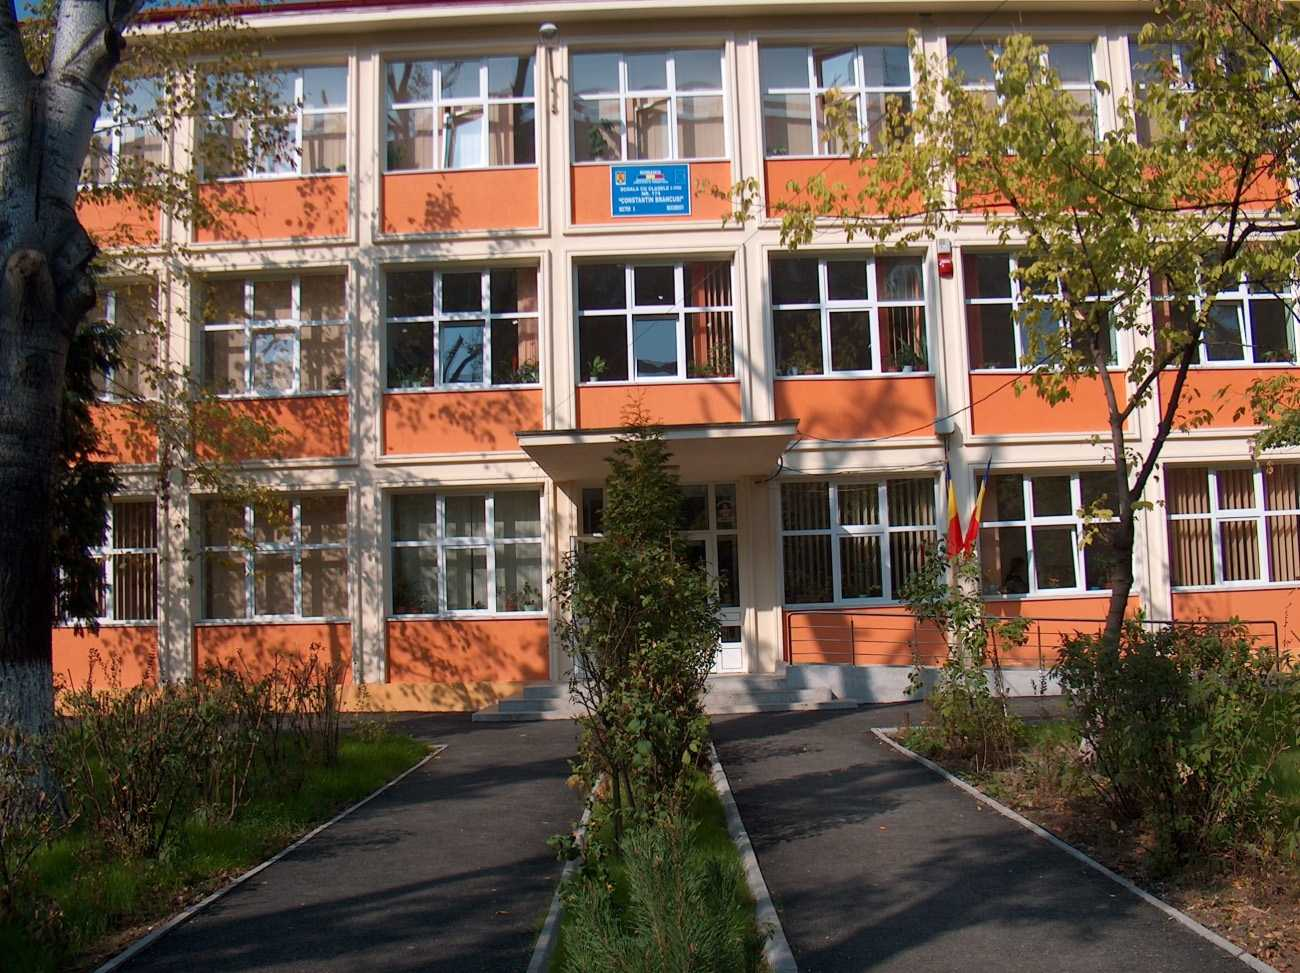 Sistem eletronic de monitorizare a absentelor in scoli?